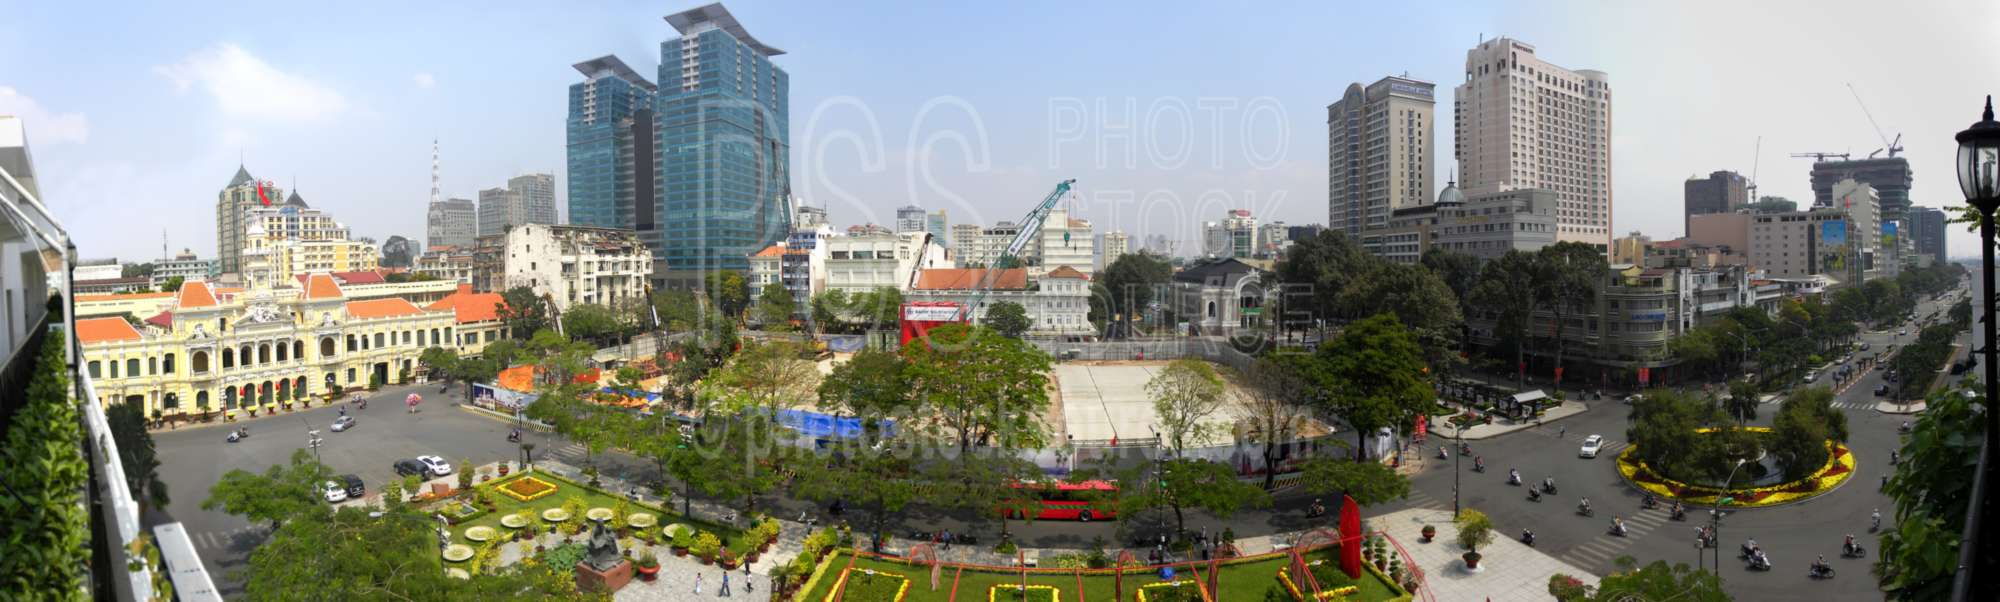 Downtown Saigon